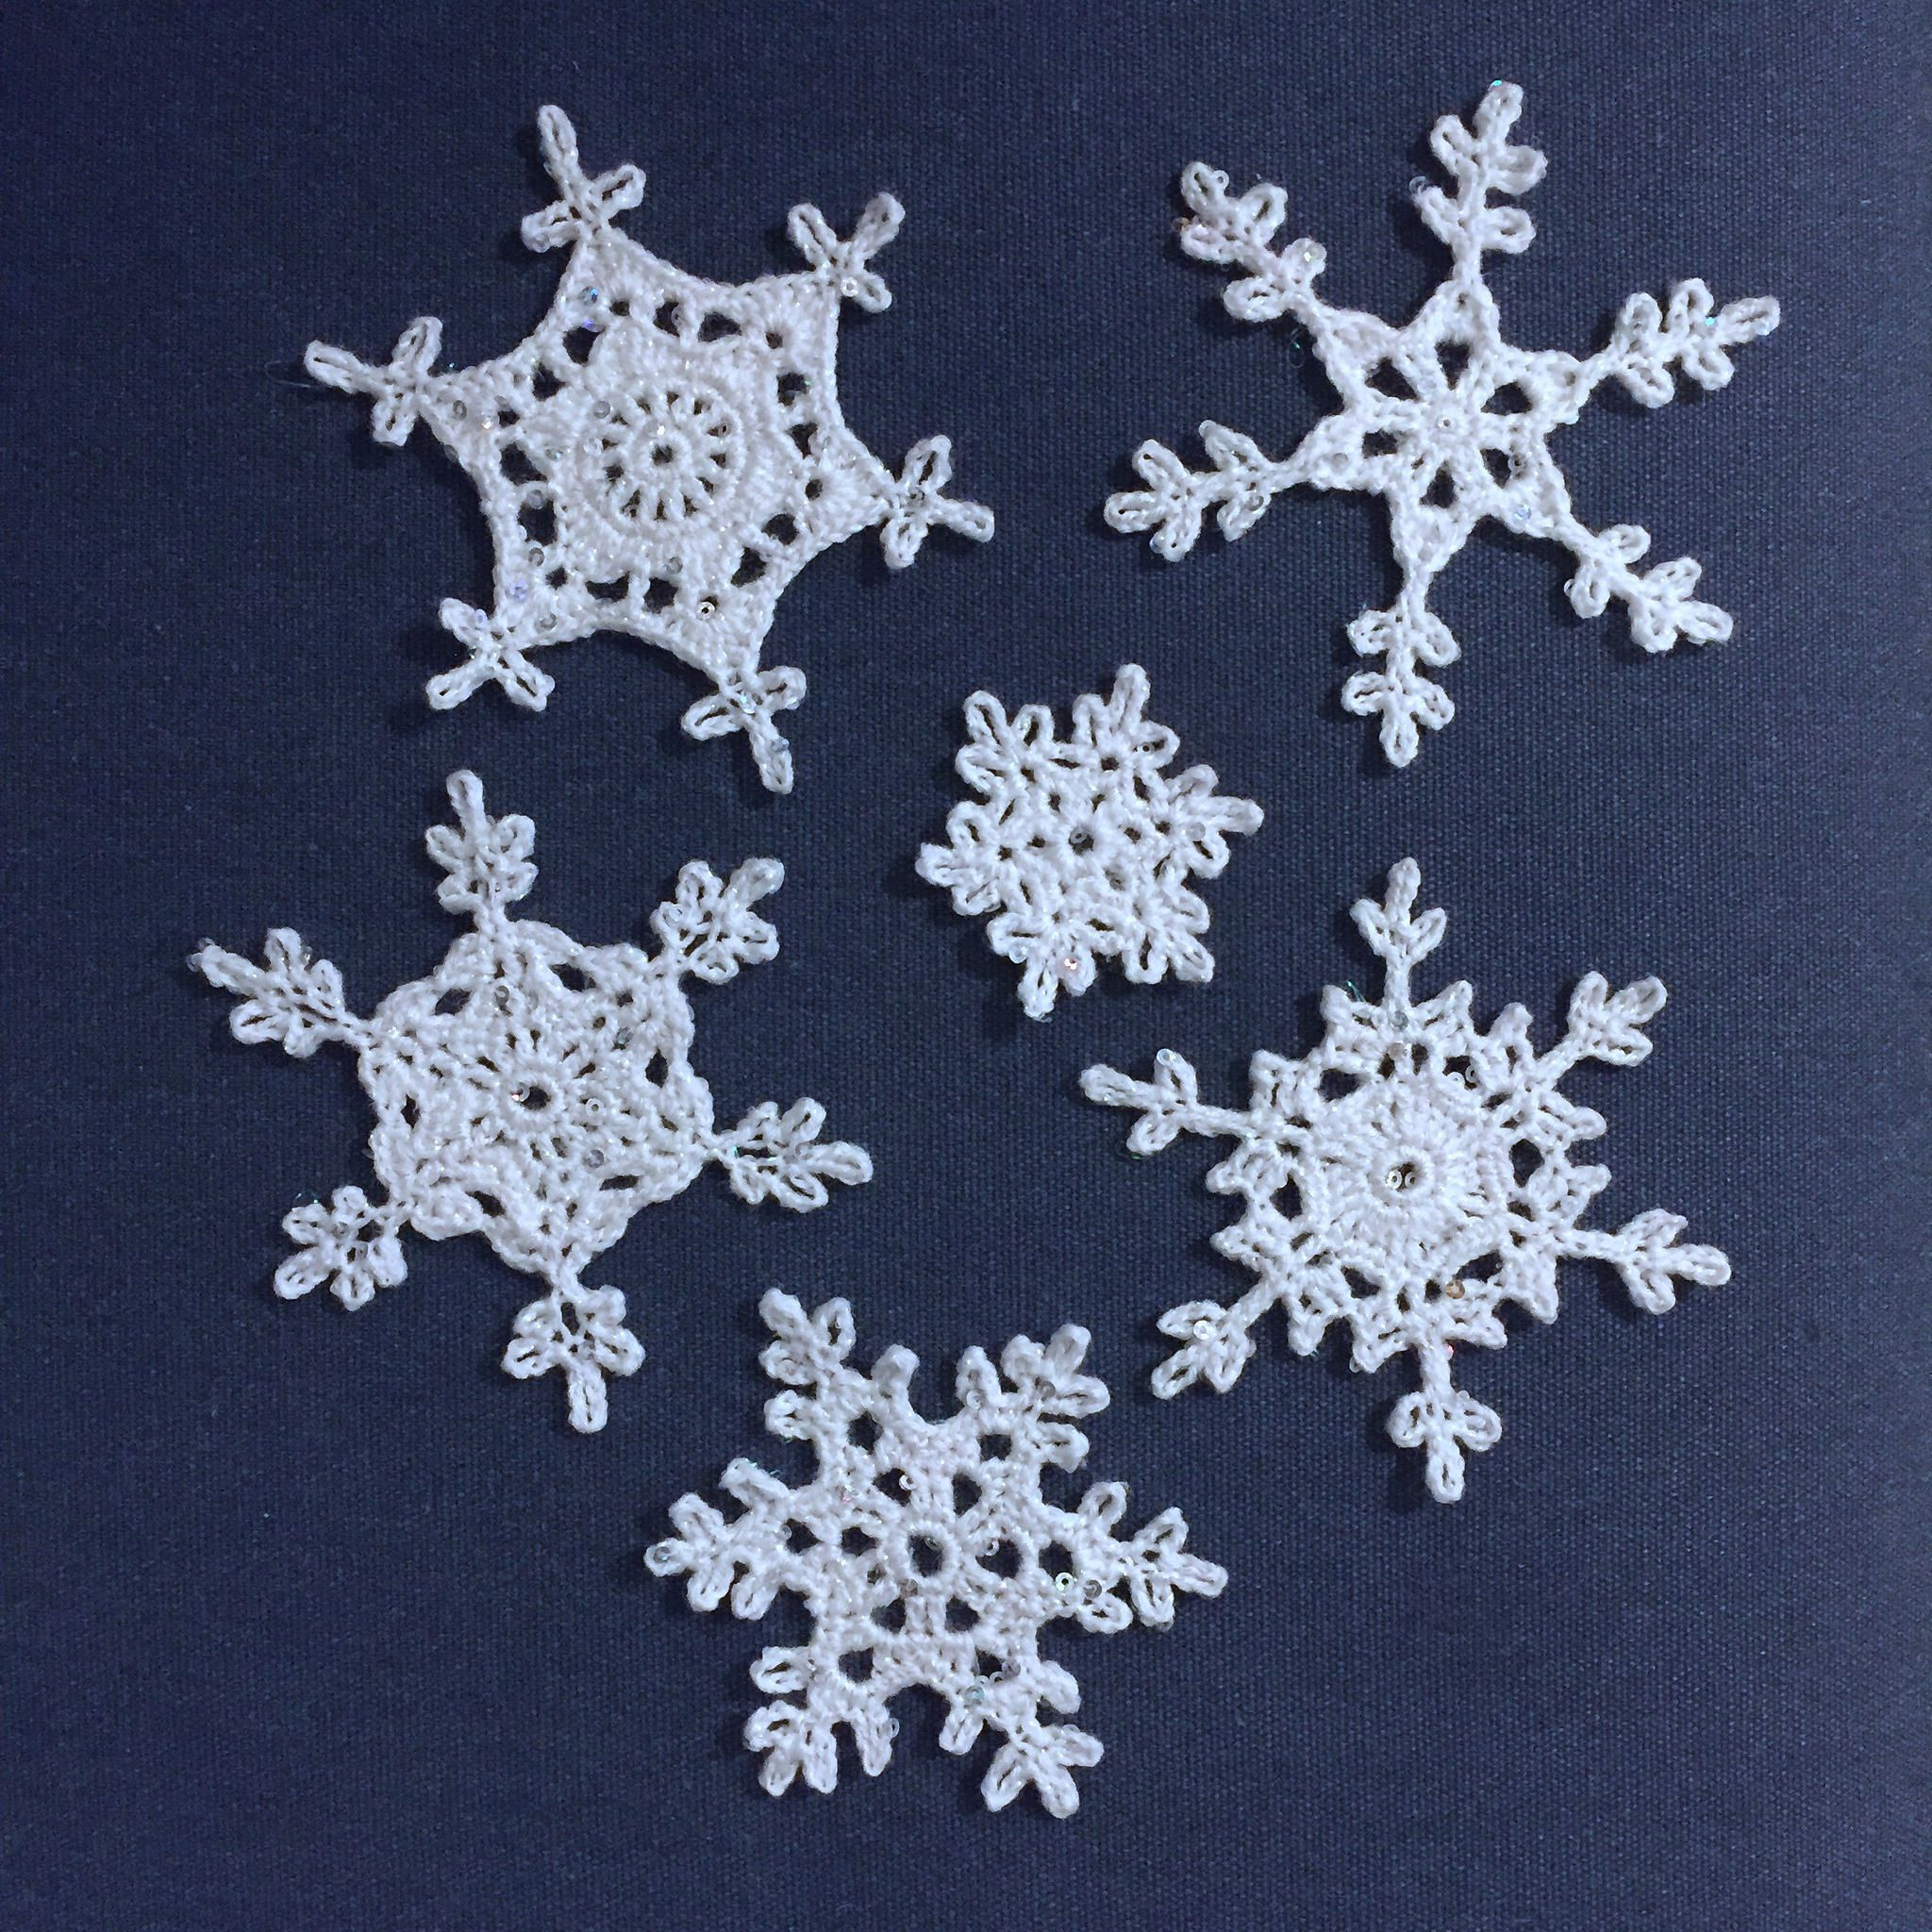 Suvi S Crochet Snowflake 1 Free Crochet Pattern Crochet Snowflake Pattern Christmas Crochet Holiday Crochet